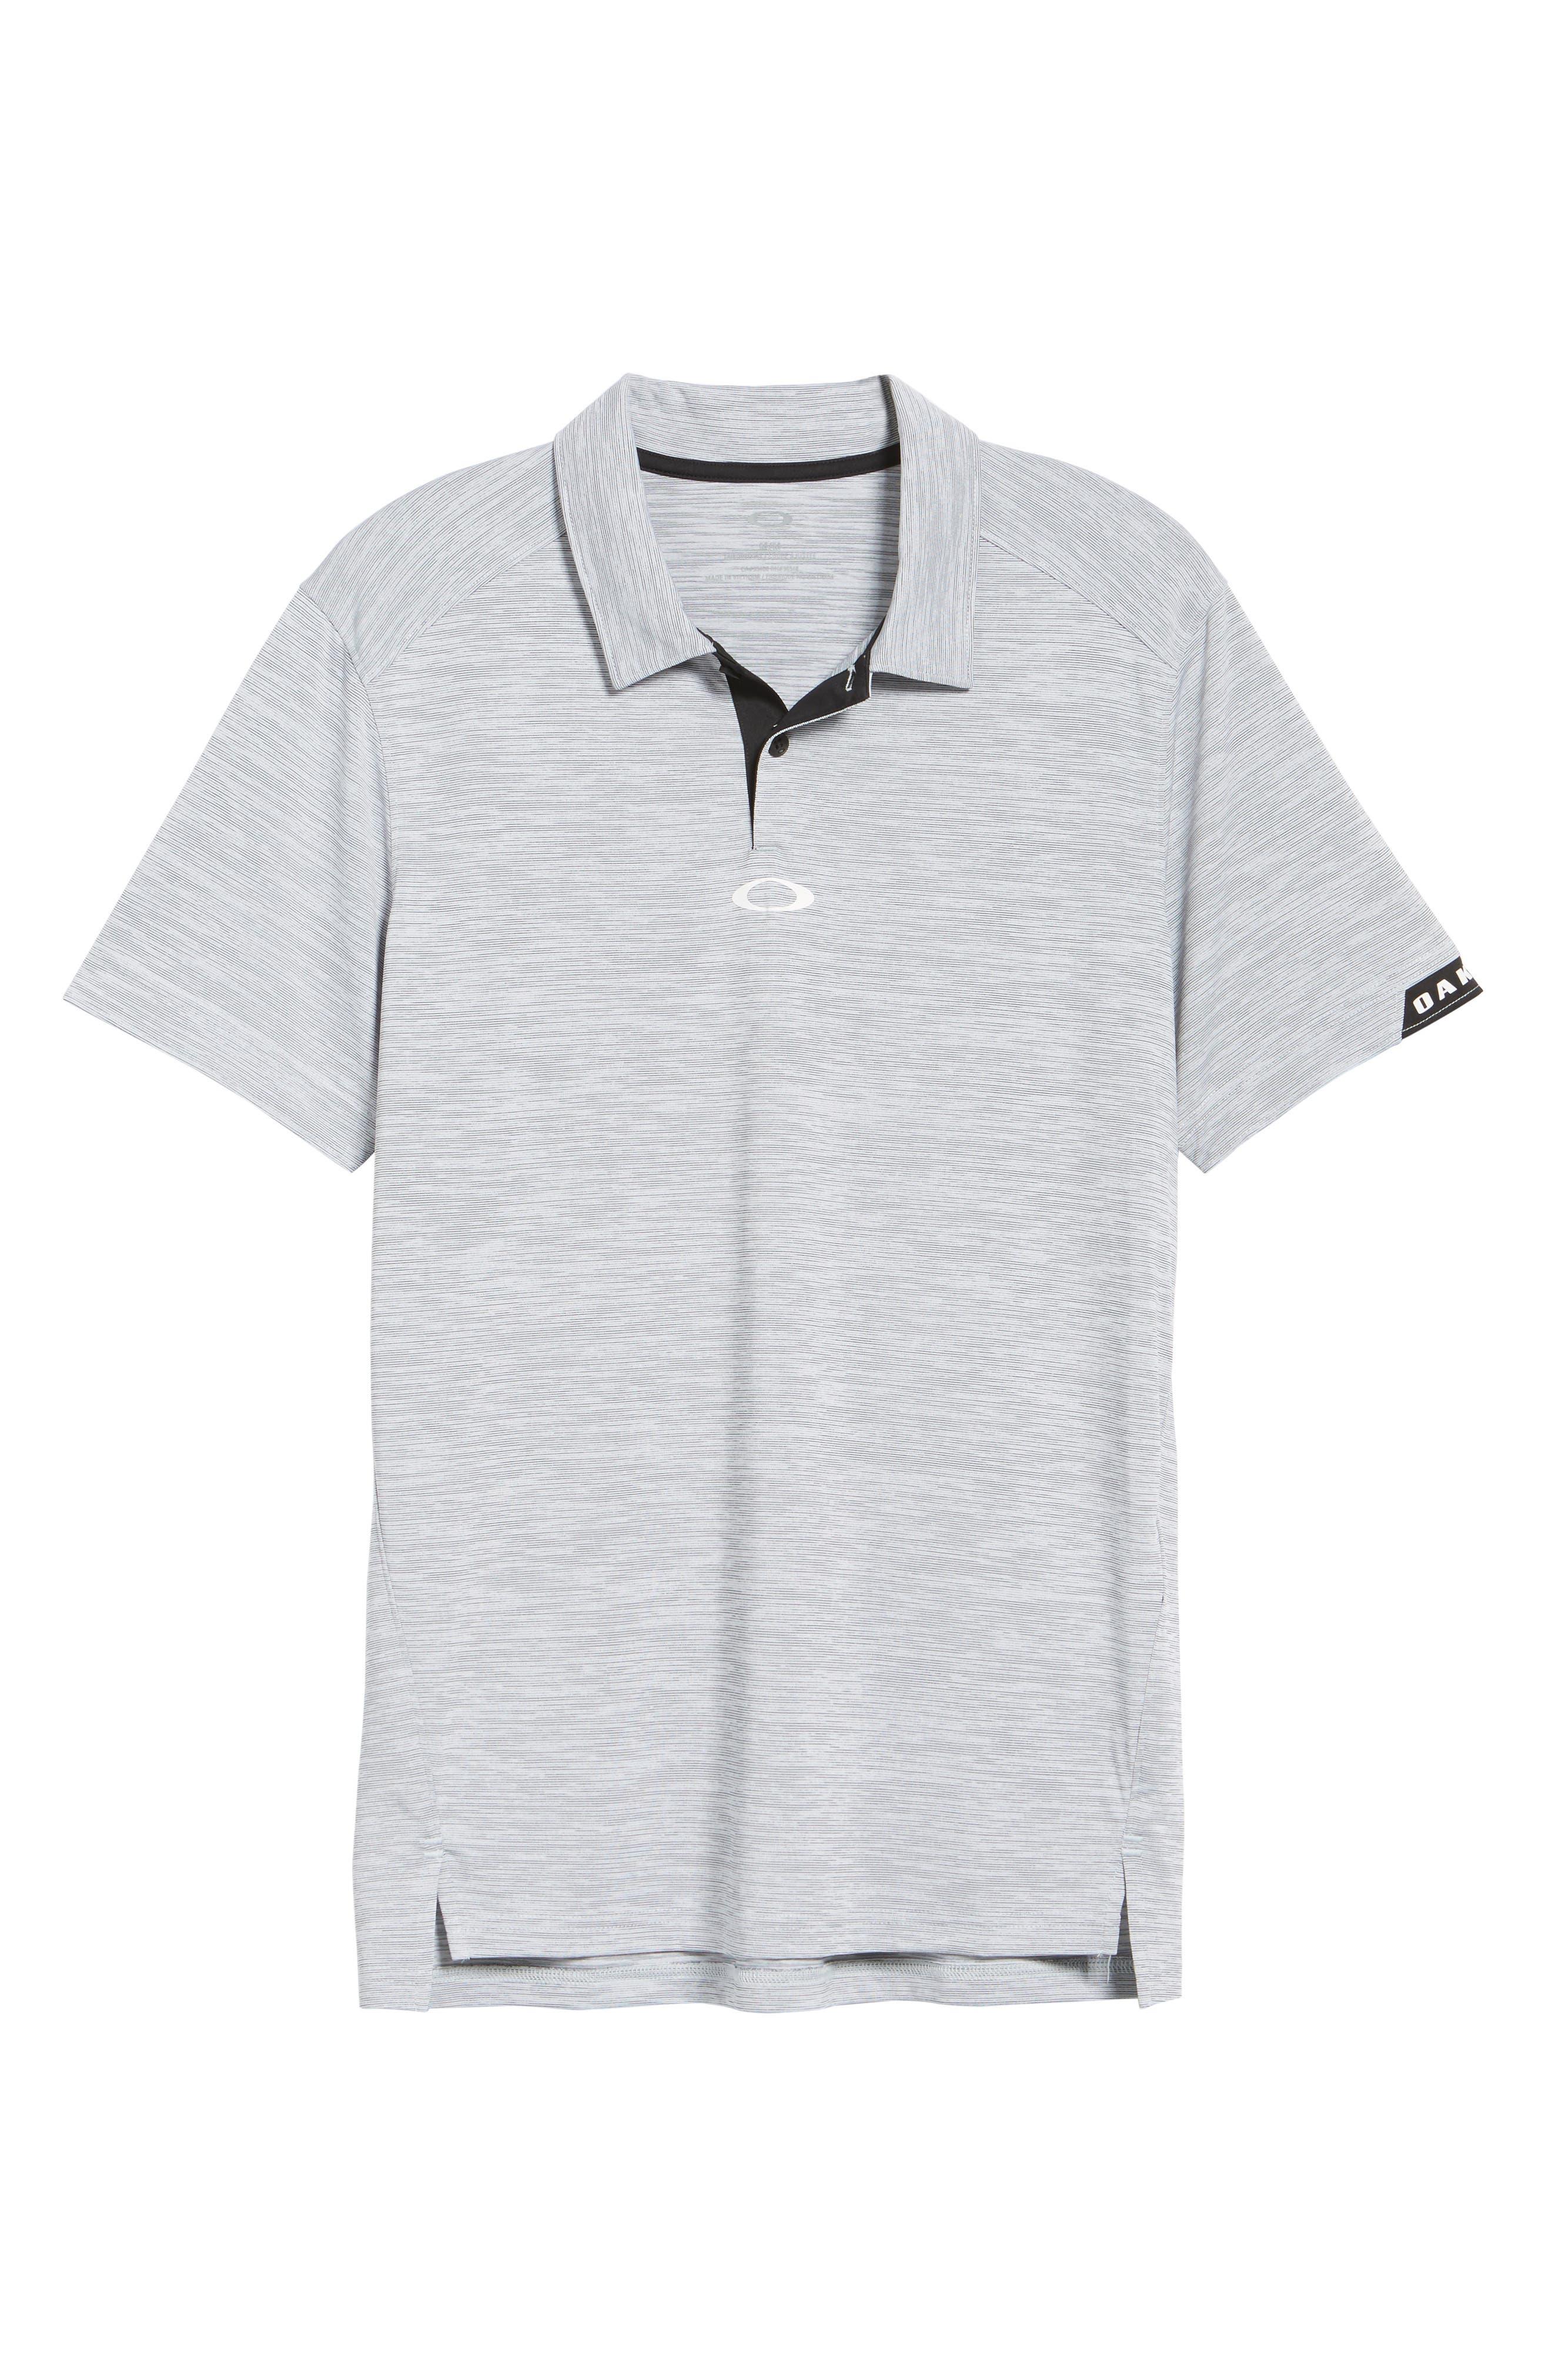 Gravity Polo Shirt,                             Alternate thumbnail 6, color,                             BLACKOUT